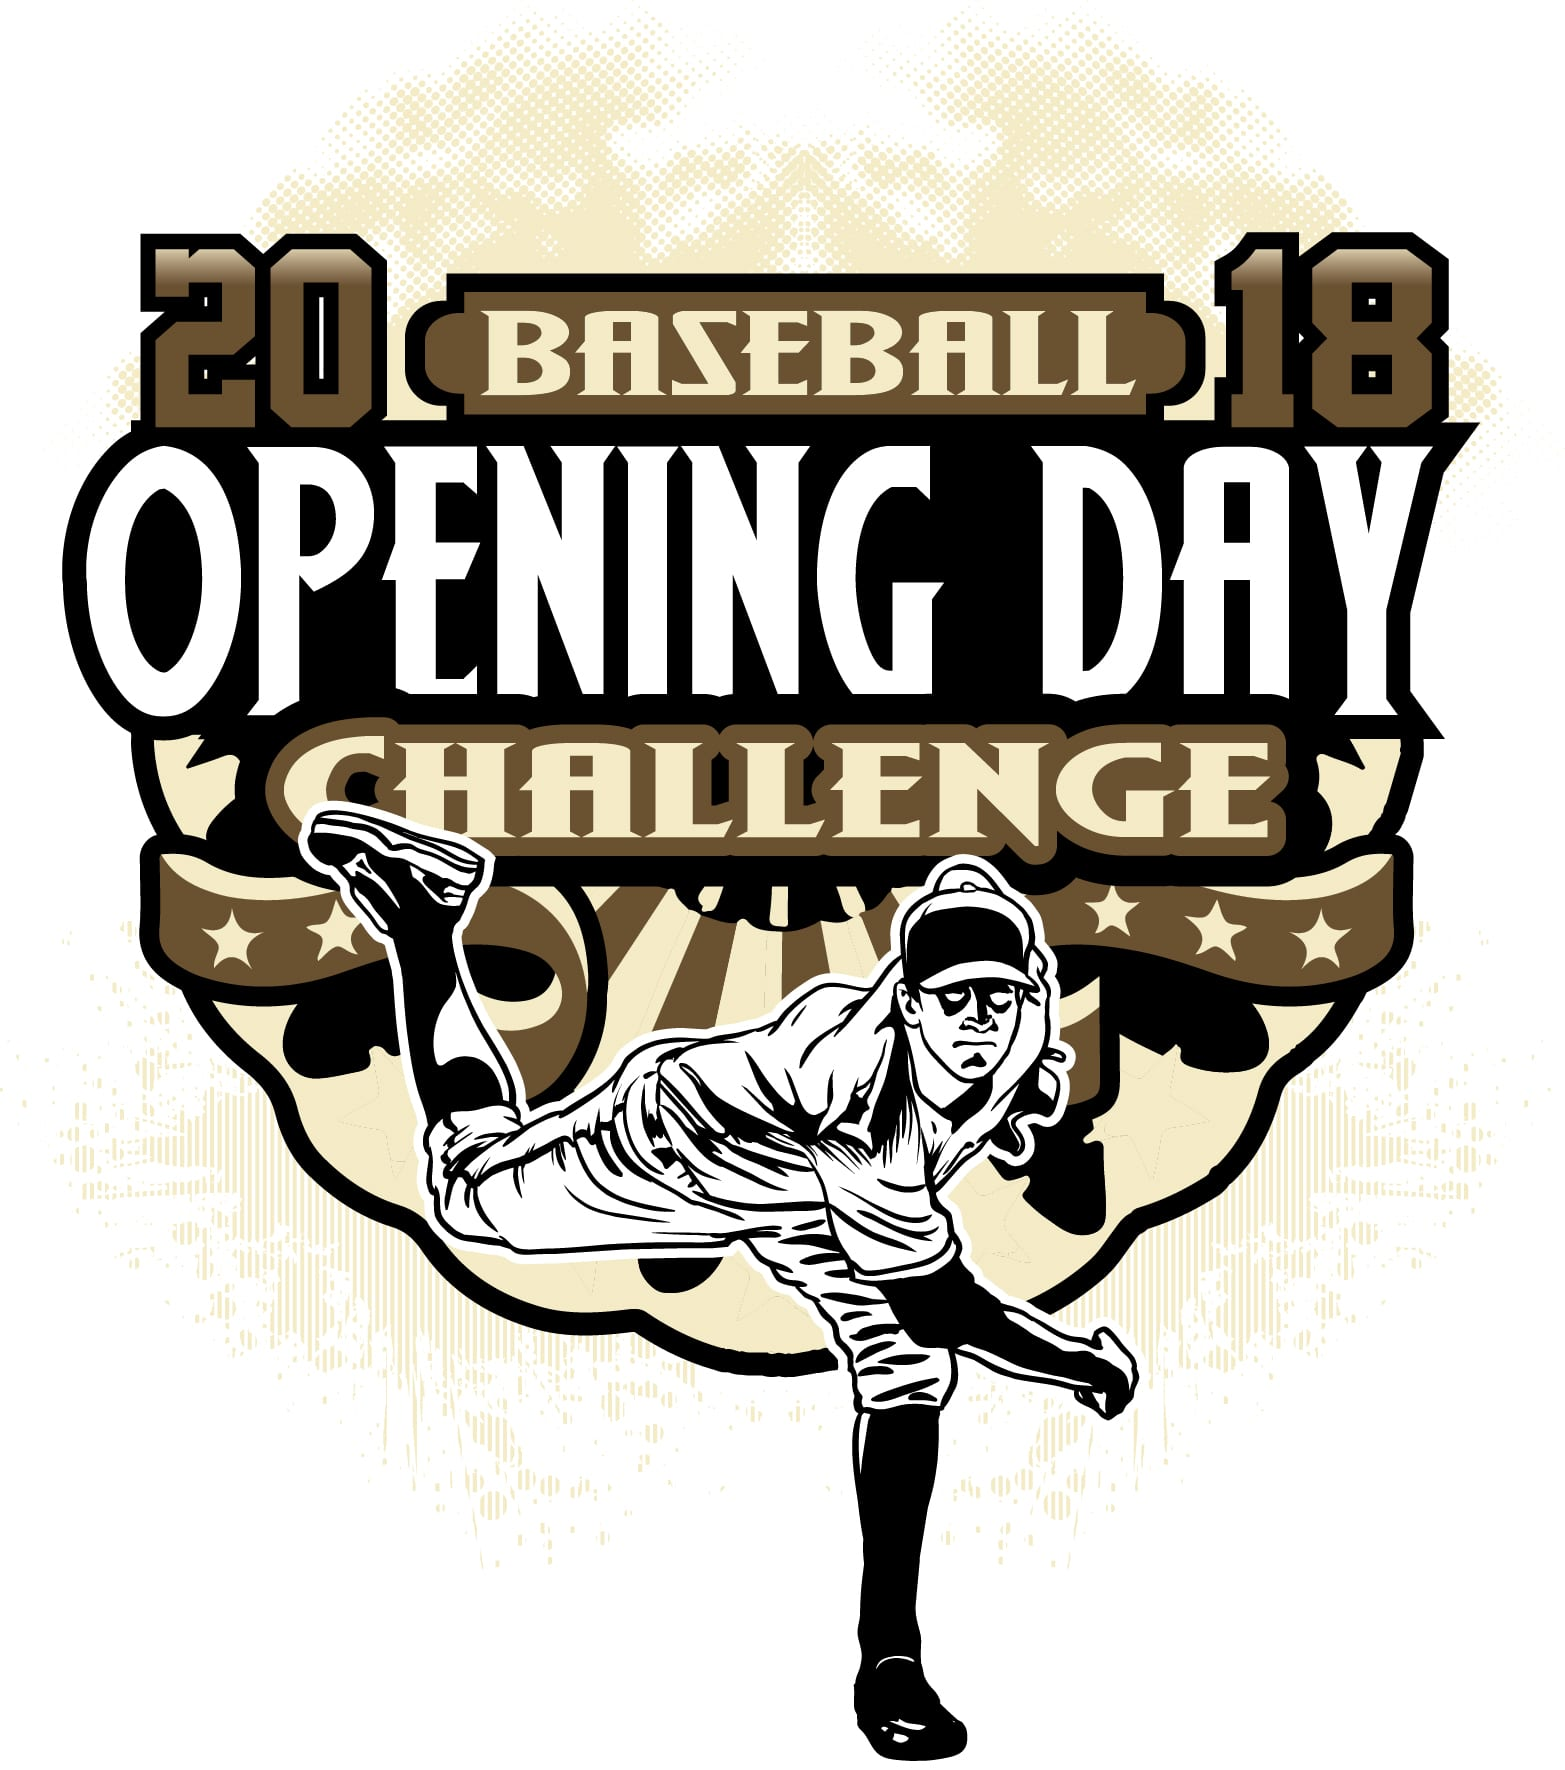 OPENING DAY CHALLENGE BASEBALL 2018 adjustable t-shirt logo design